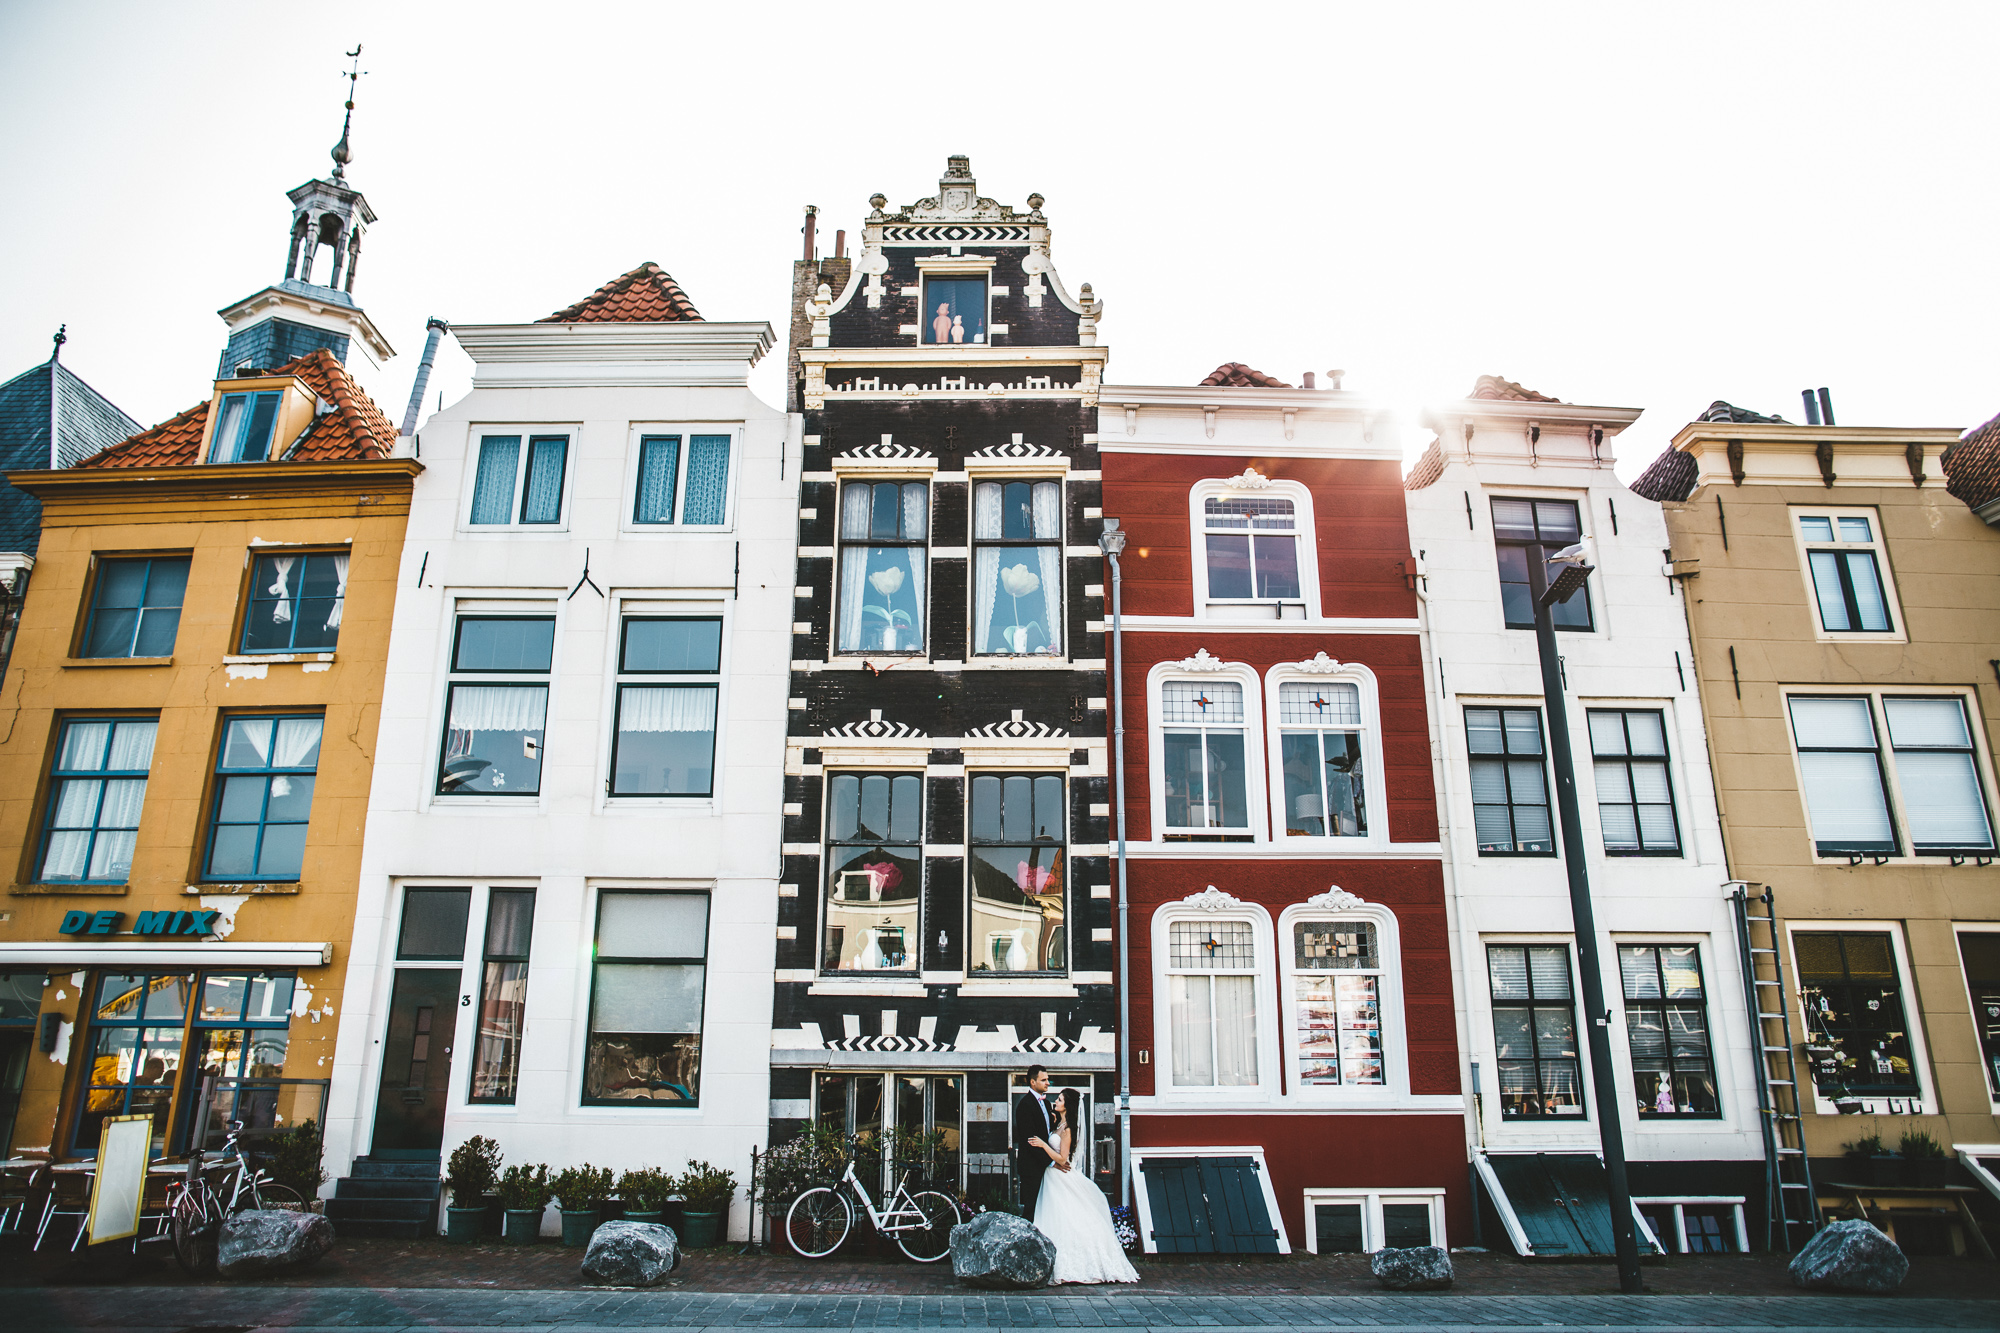 after wedding ia 018 - Afterwedding in Zeeland / Holland